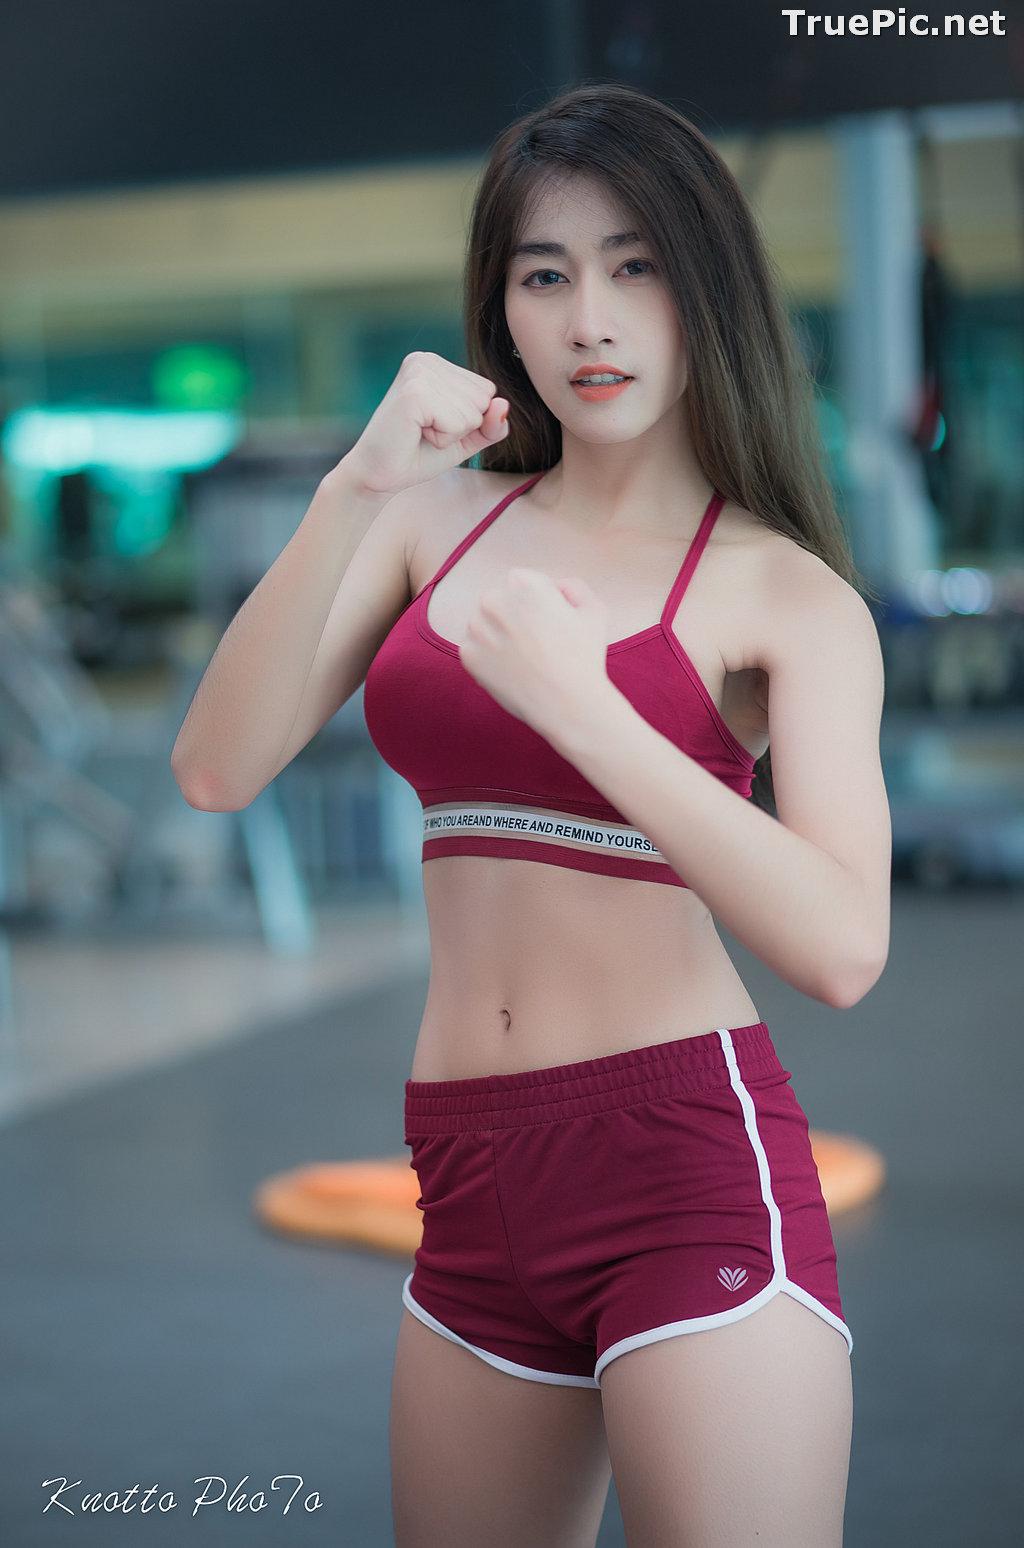 Image Thailand Hot Beauty Model - Nisa Khamarat - Red and Black Fitness Set - TruePic.net - Picture-1